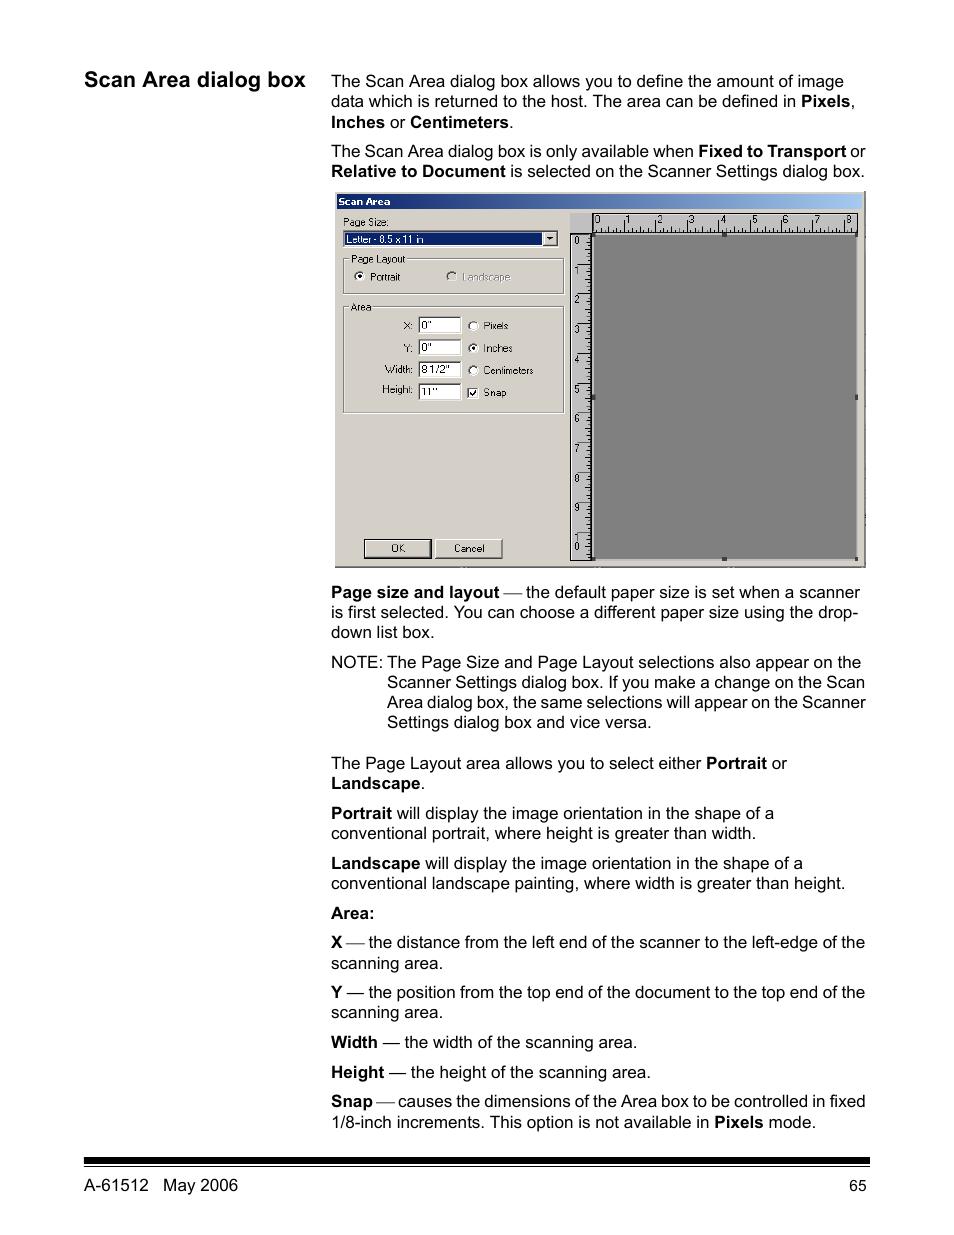 user manual i30 open source user manual infiniti i30 owners manual 2001 infiniti i30 owners manual